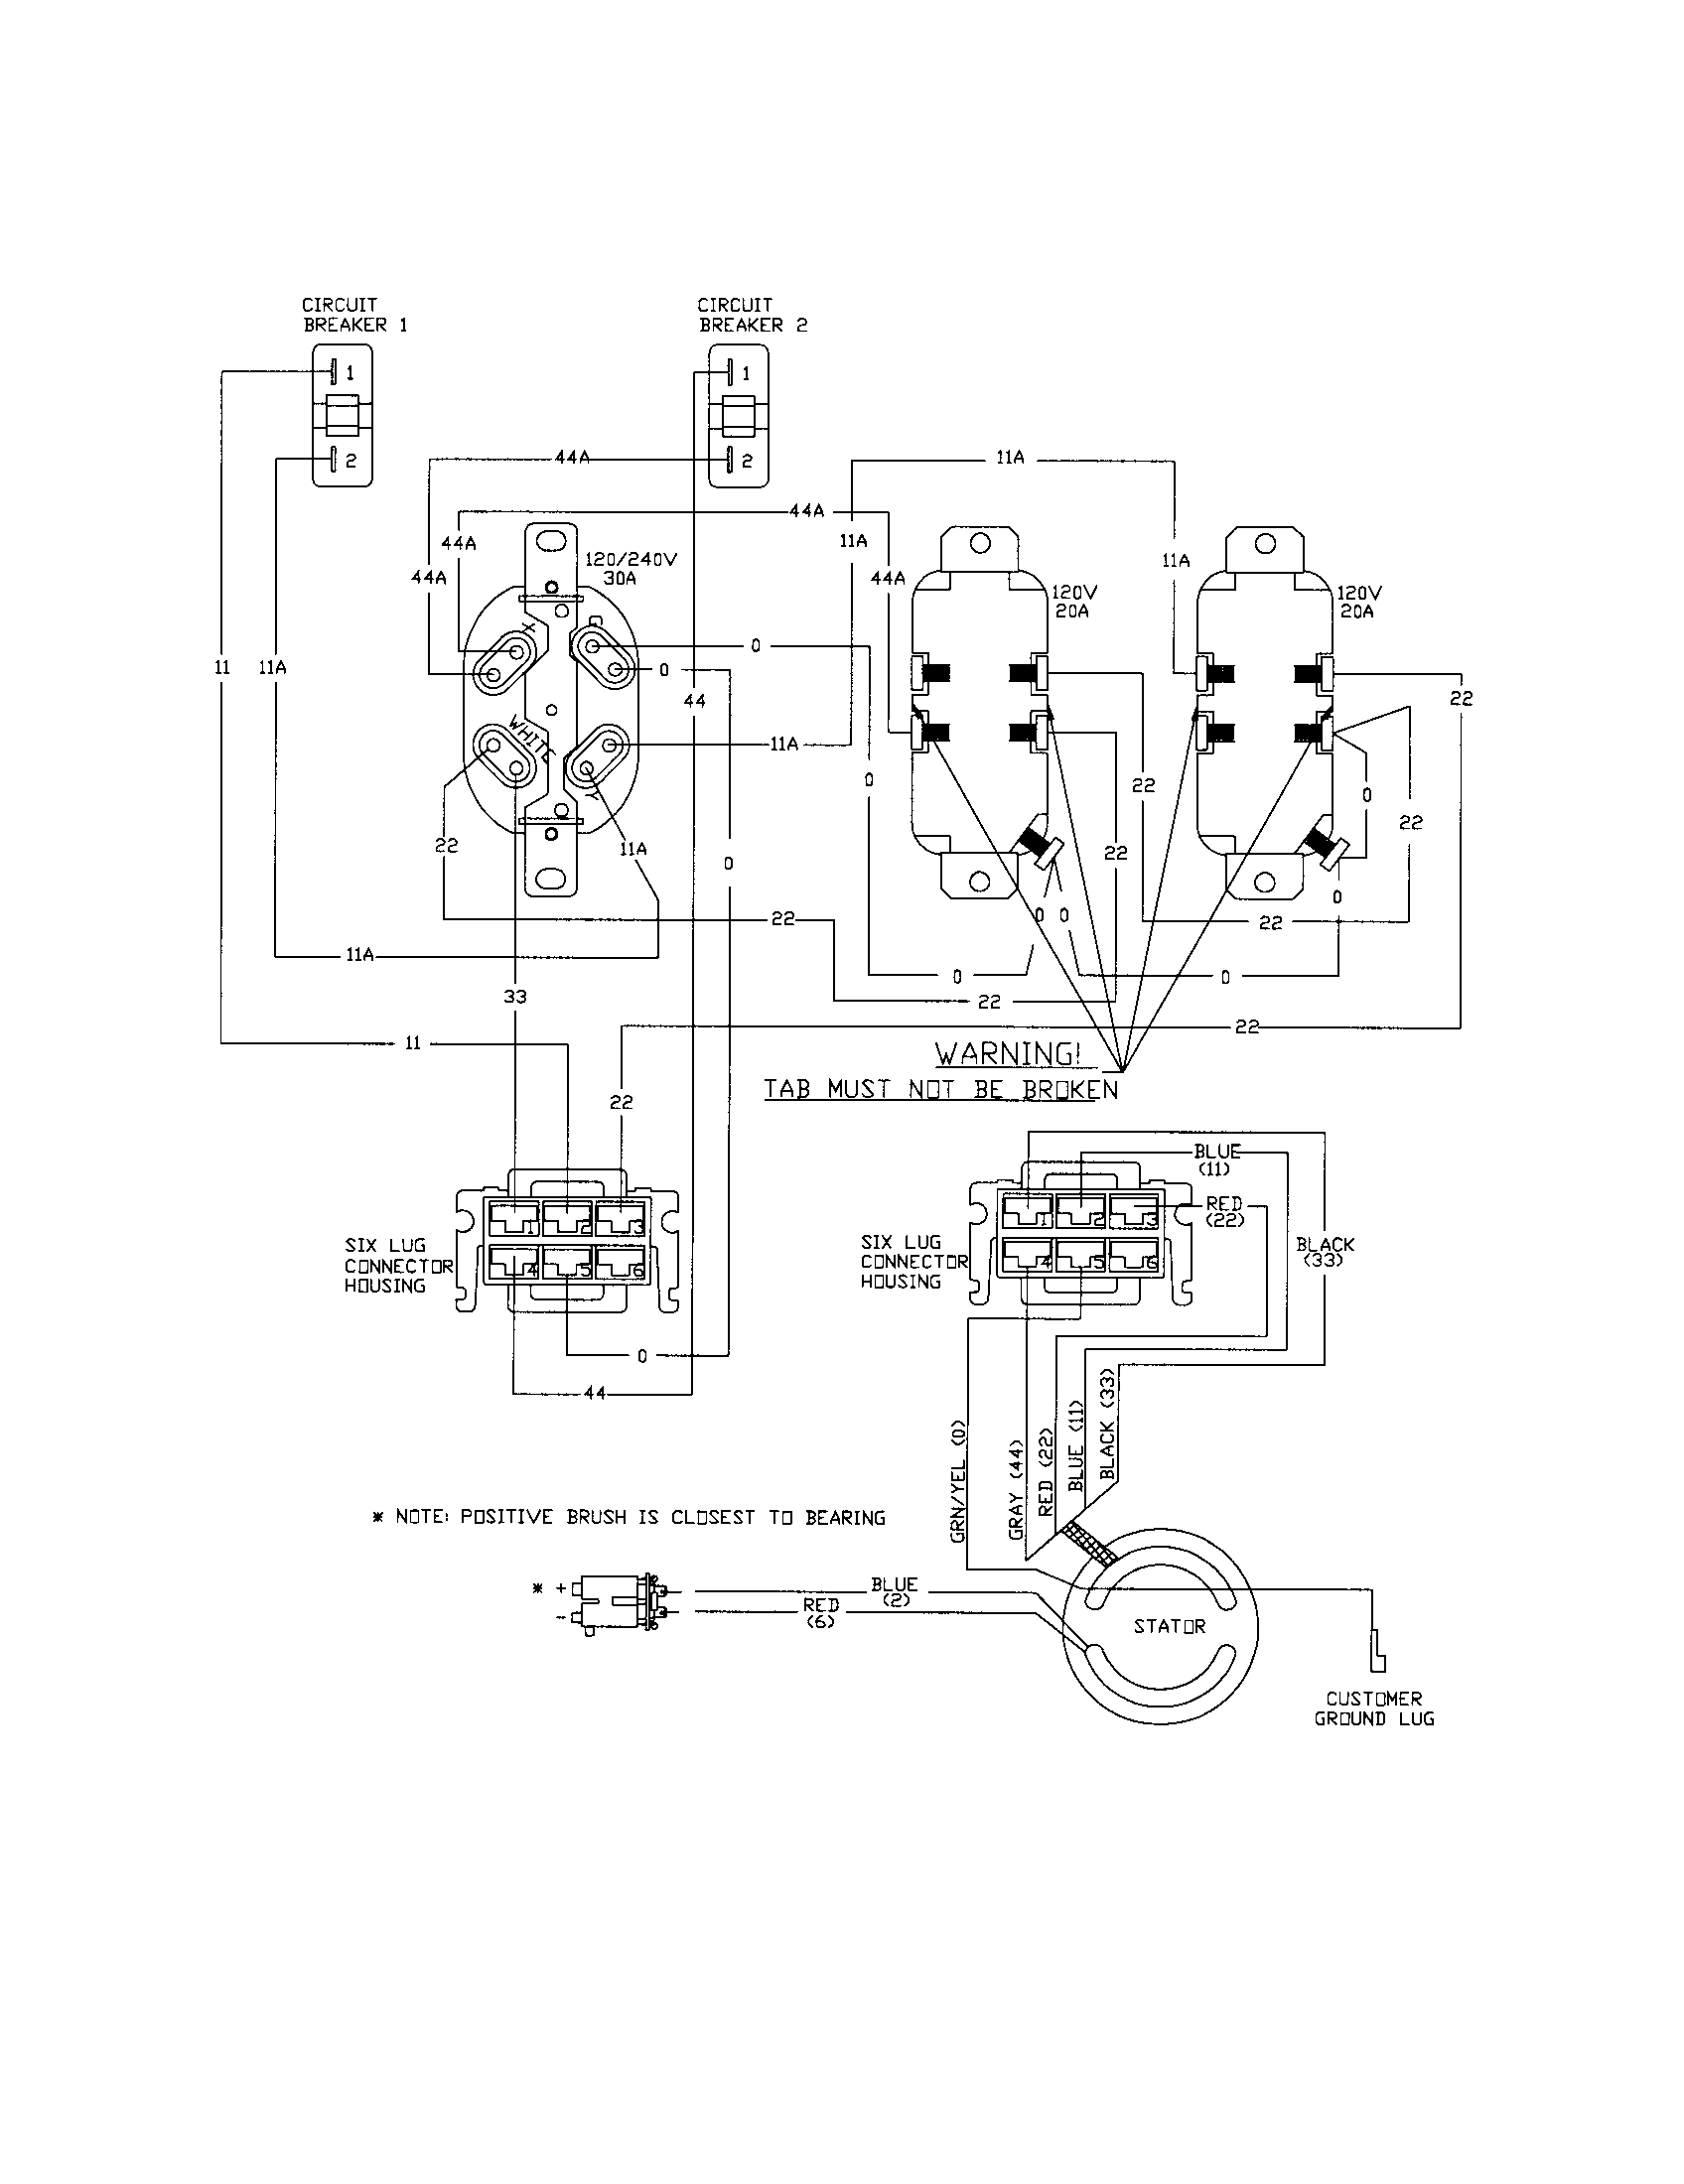 Craftsman model 580325600 generator genuine parts